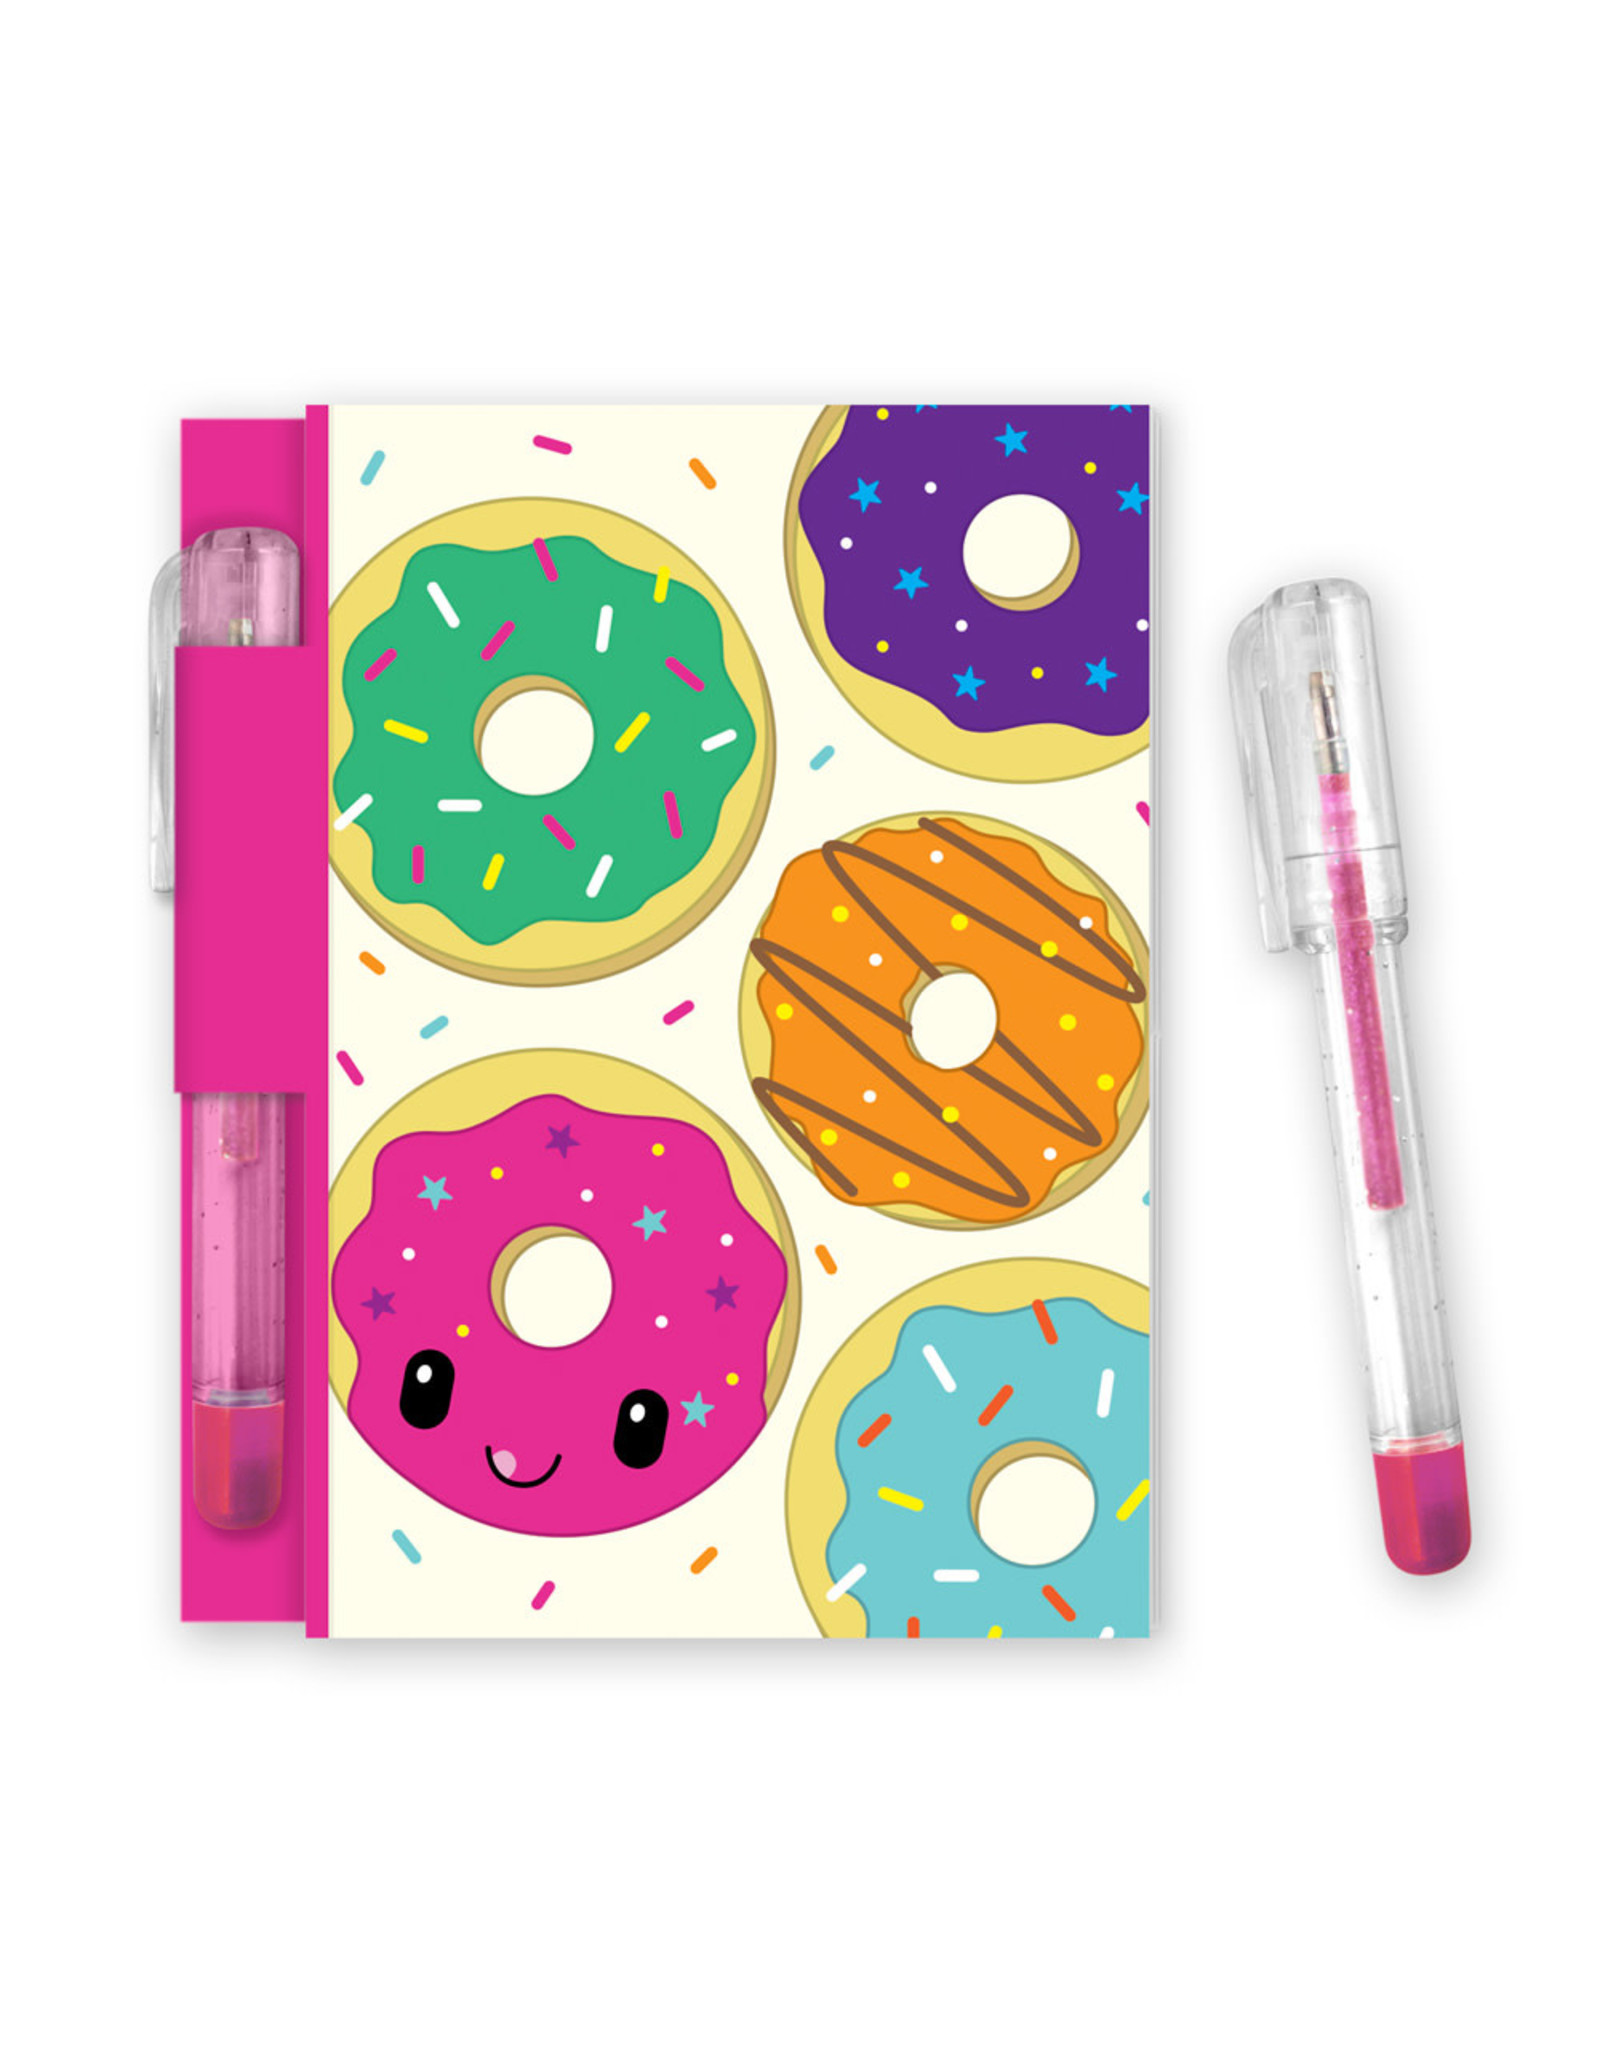 Scentco Yummy Sketch Sniff Note Pad & Pen Jelly Donut